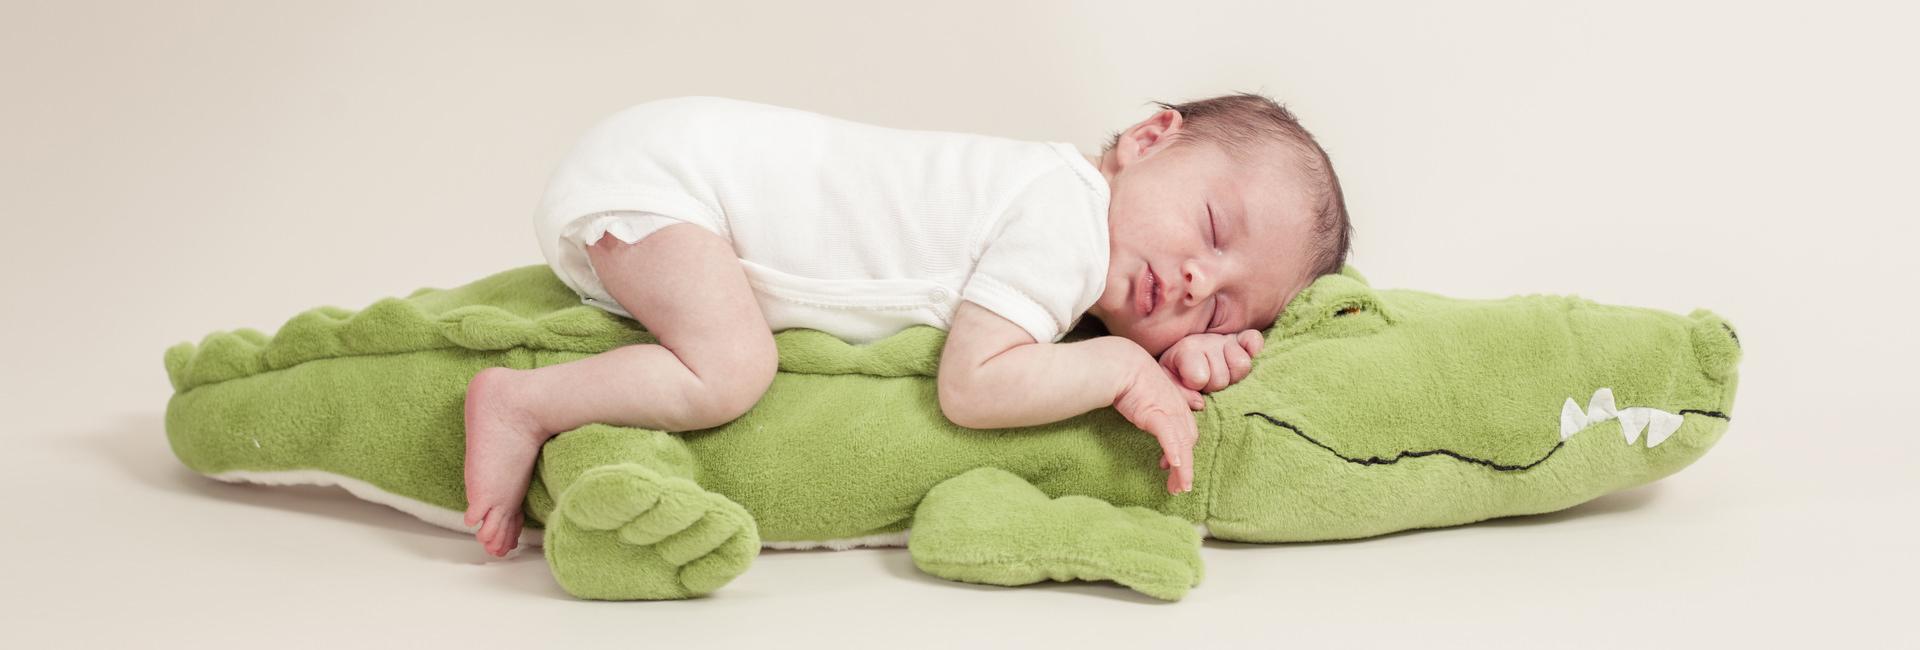 photographe-saint-nazaire-studio-bebe